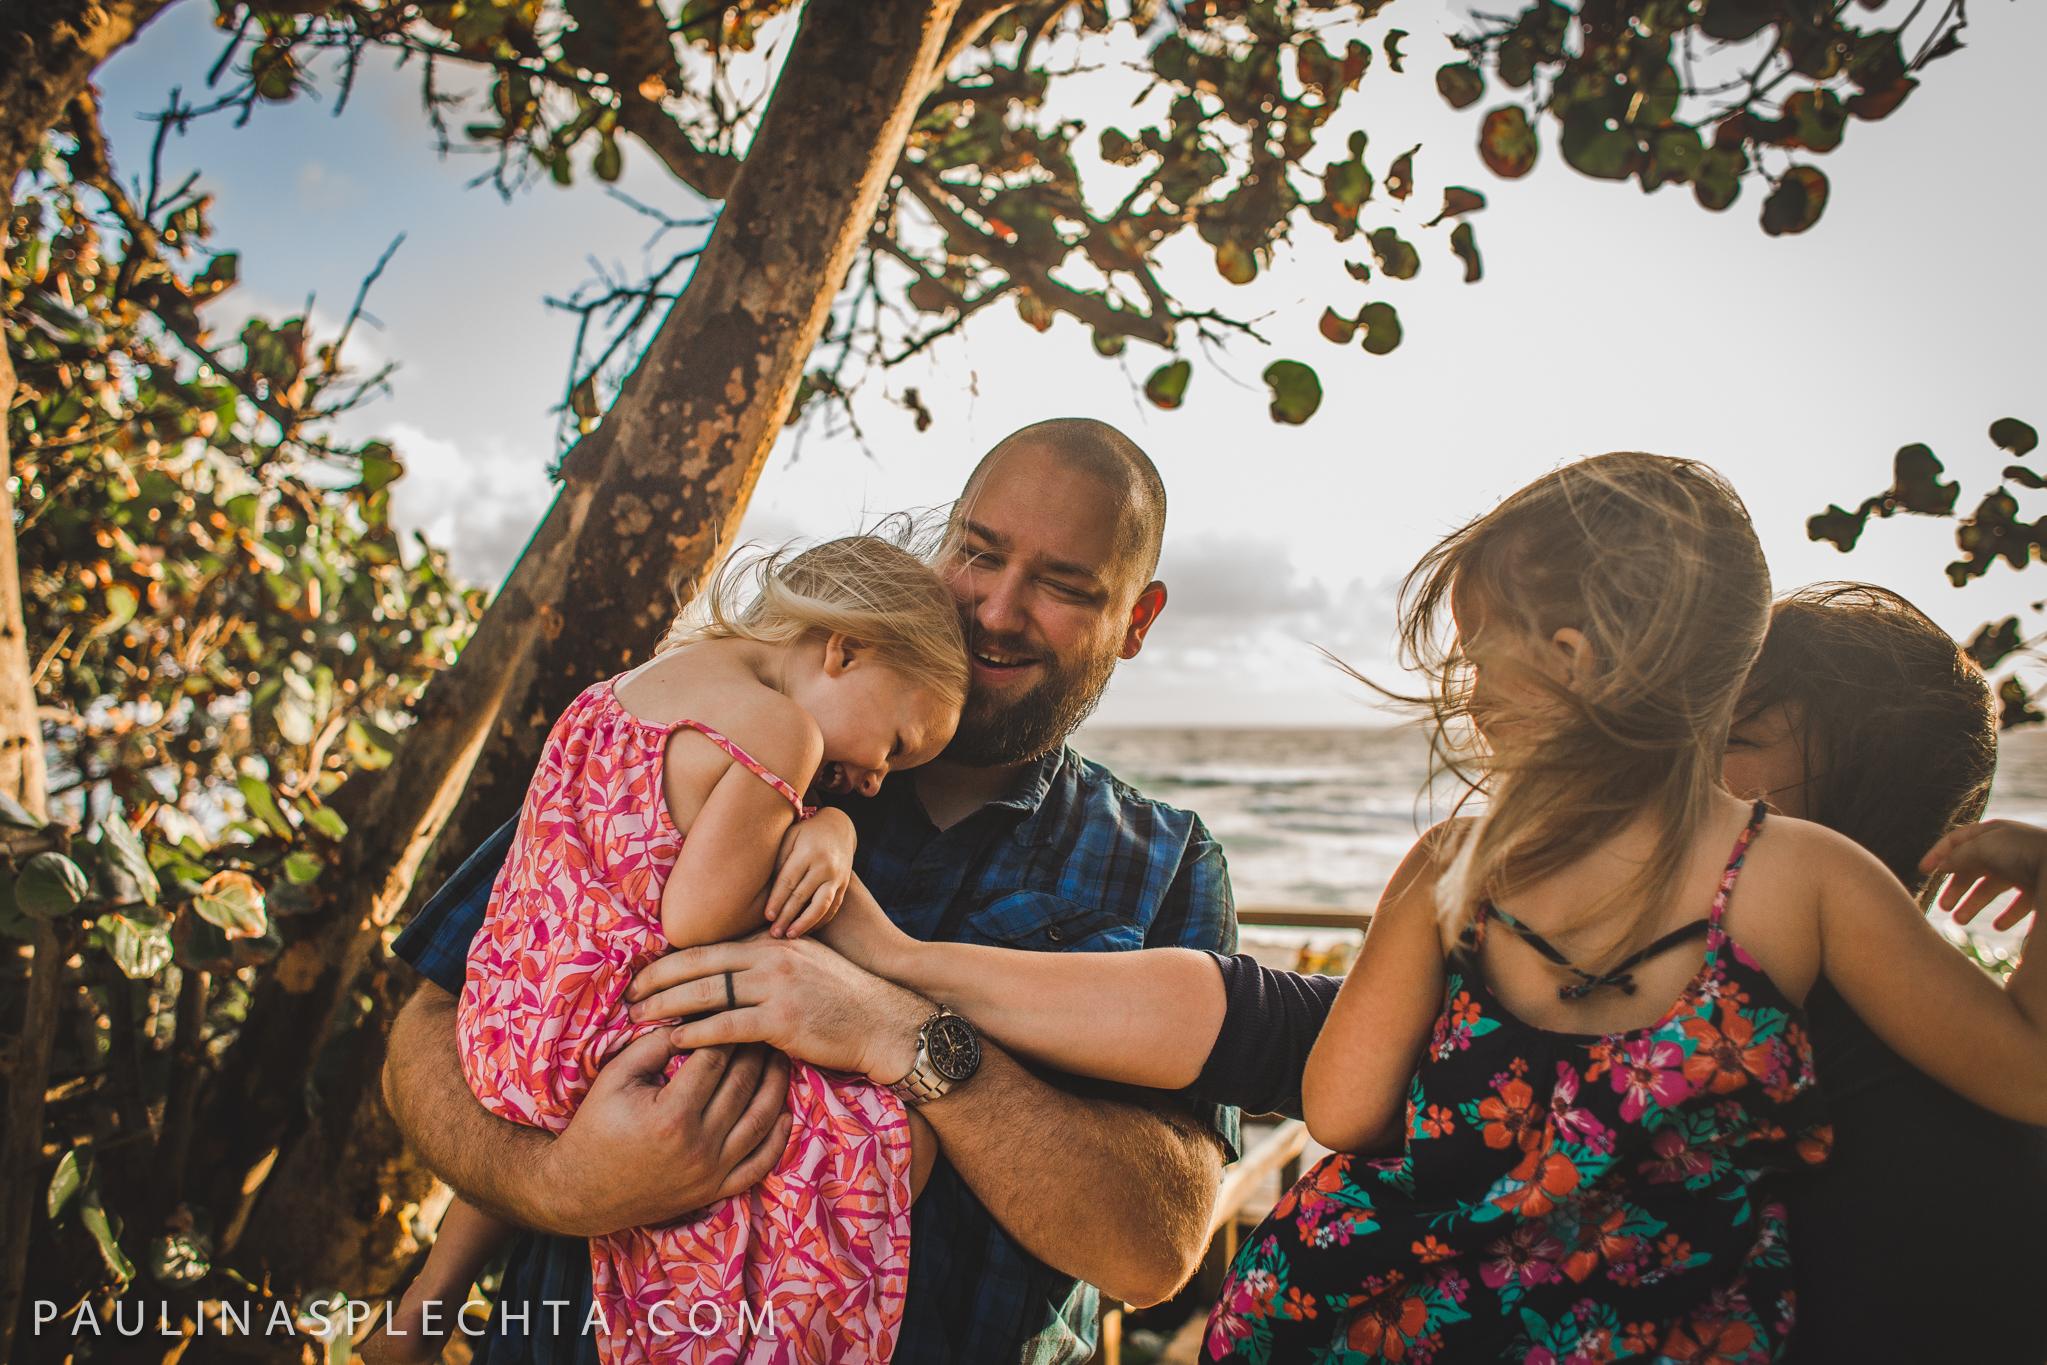 Family Photographer South Florida Pompano Broward Palm Beach Babies Baby Newborn Breastfeeding Birth Photograpy Beach Home Documentary Session-66.jpg